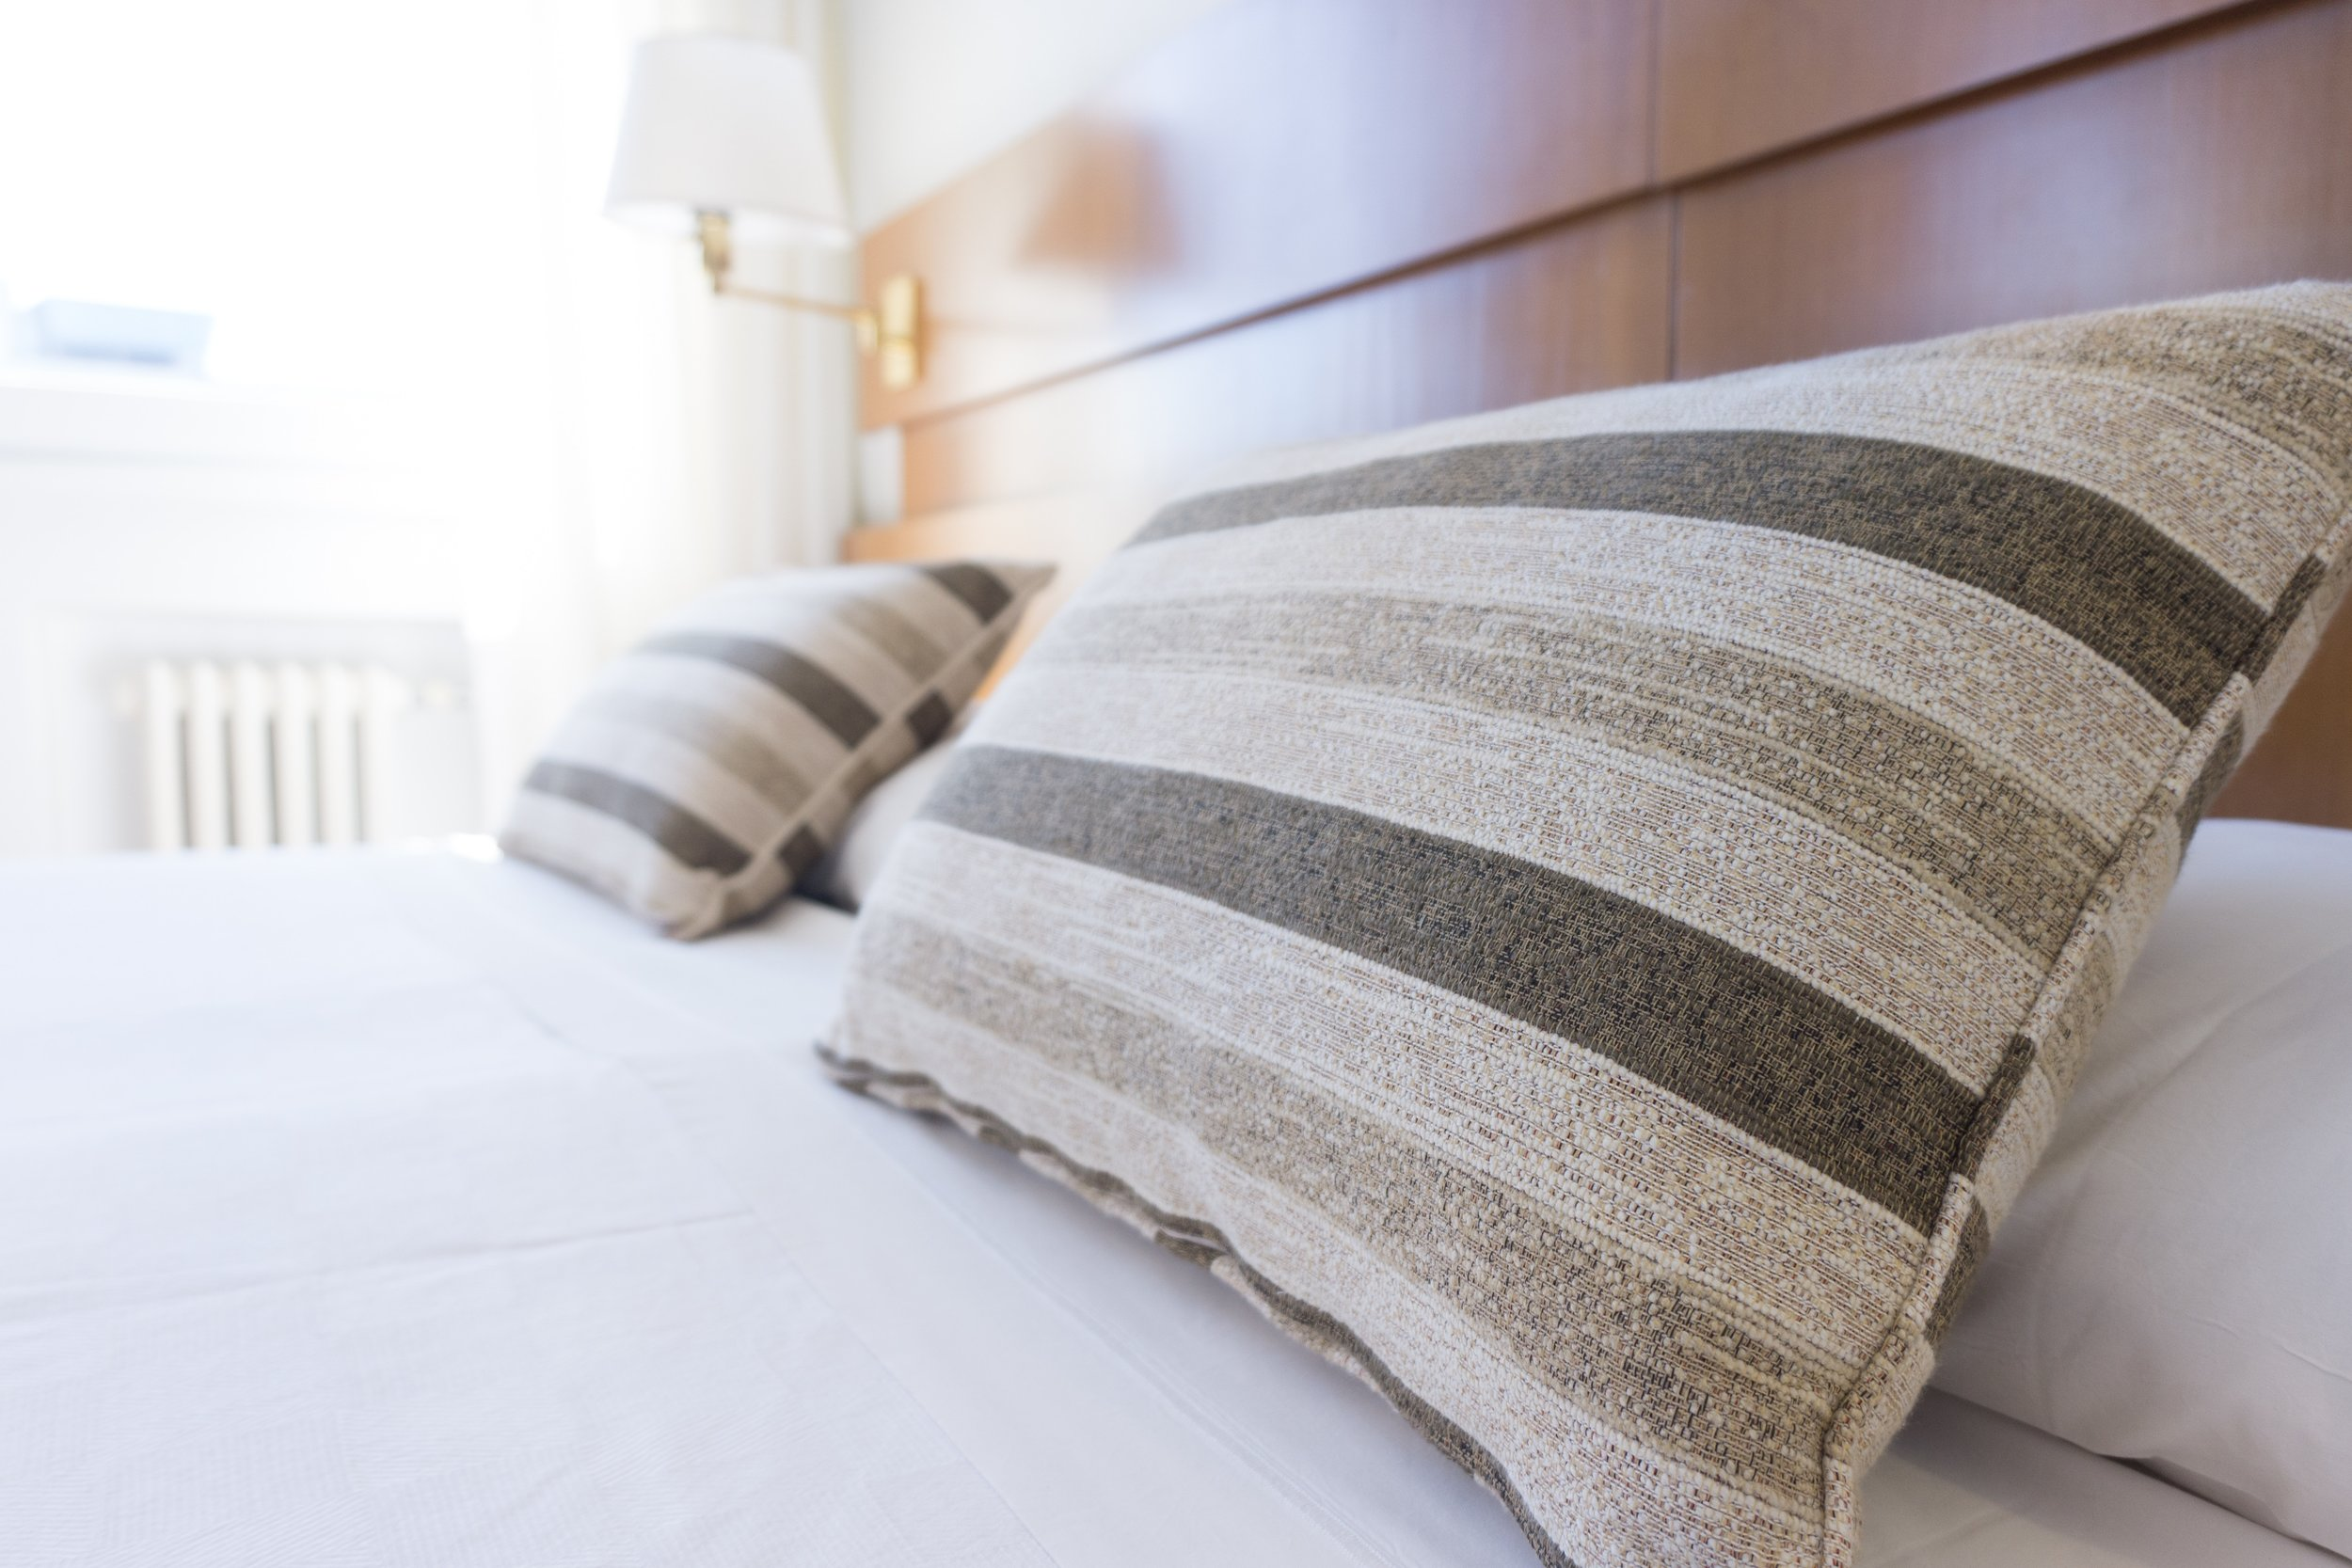 Hotel bed.jpg